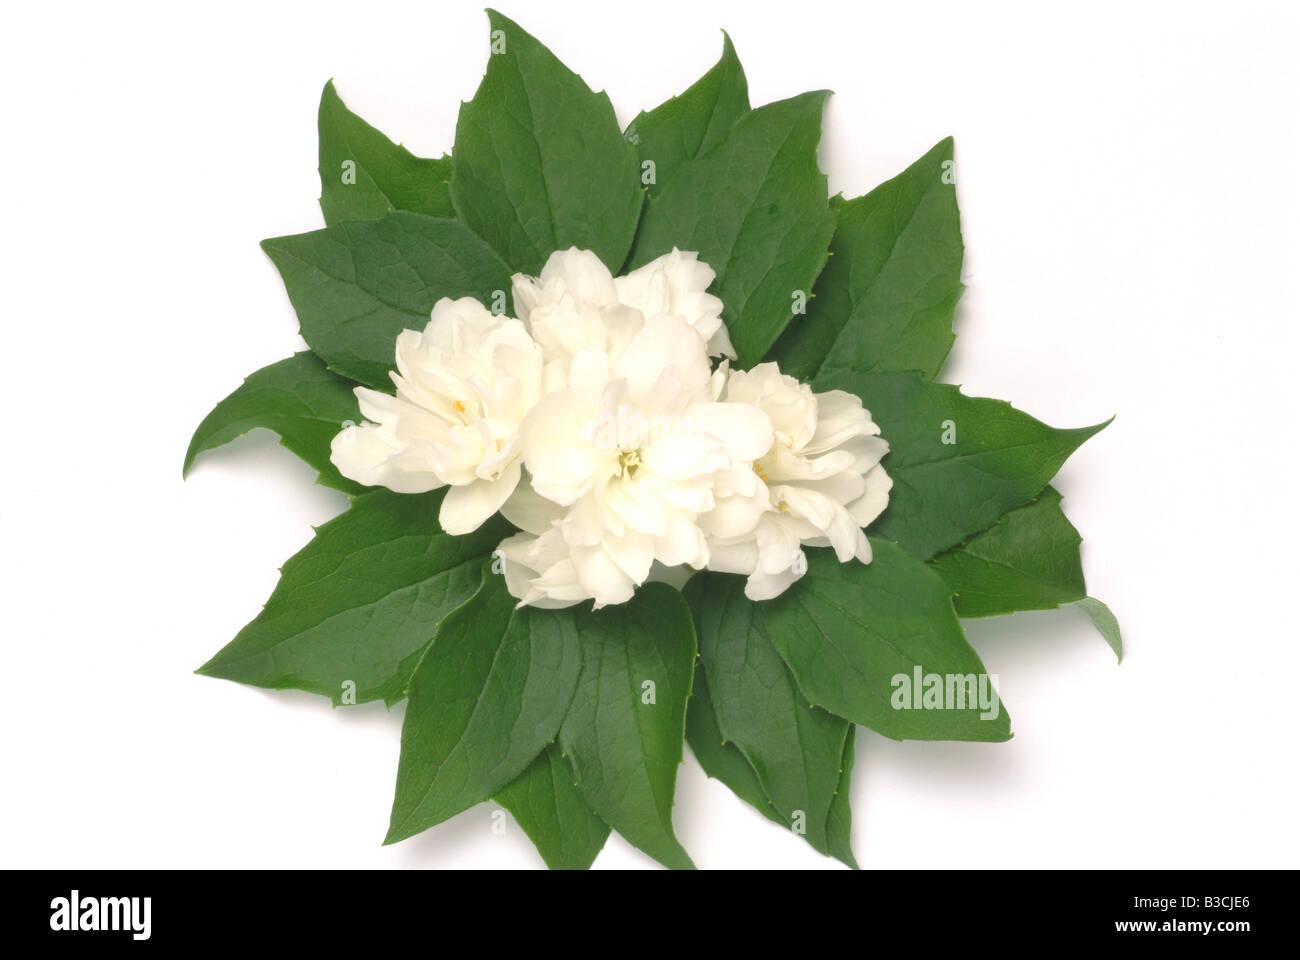 Blossoms of the medicinal plant Jasmine Jesamine Gelsemium sempervirens Jasminum officinale - Stock Image